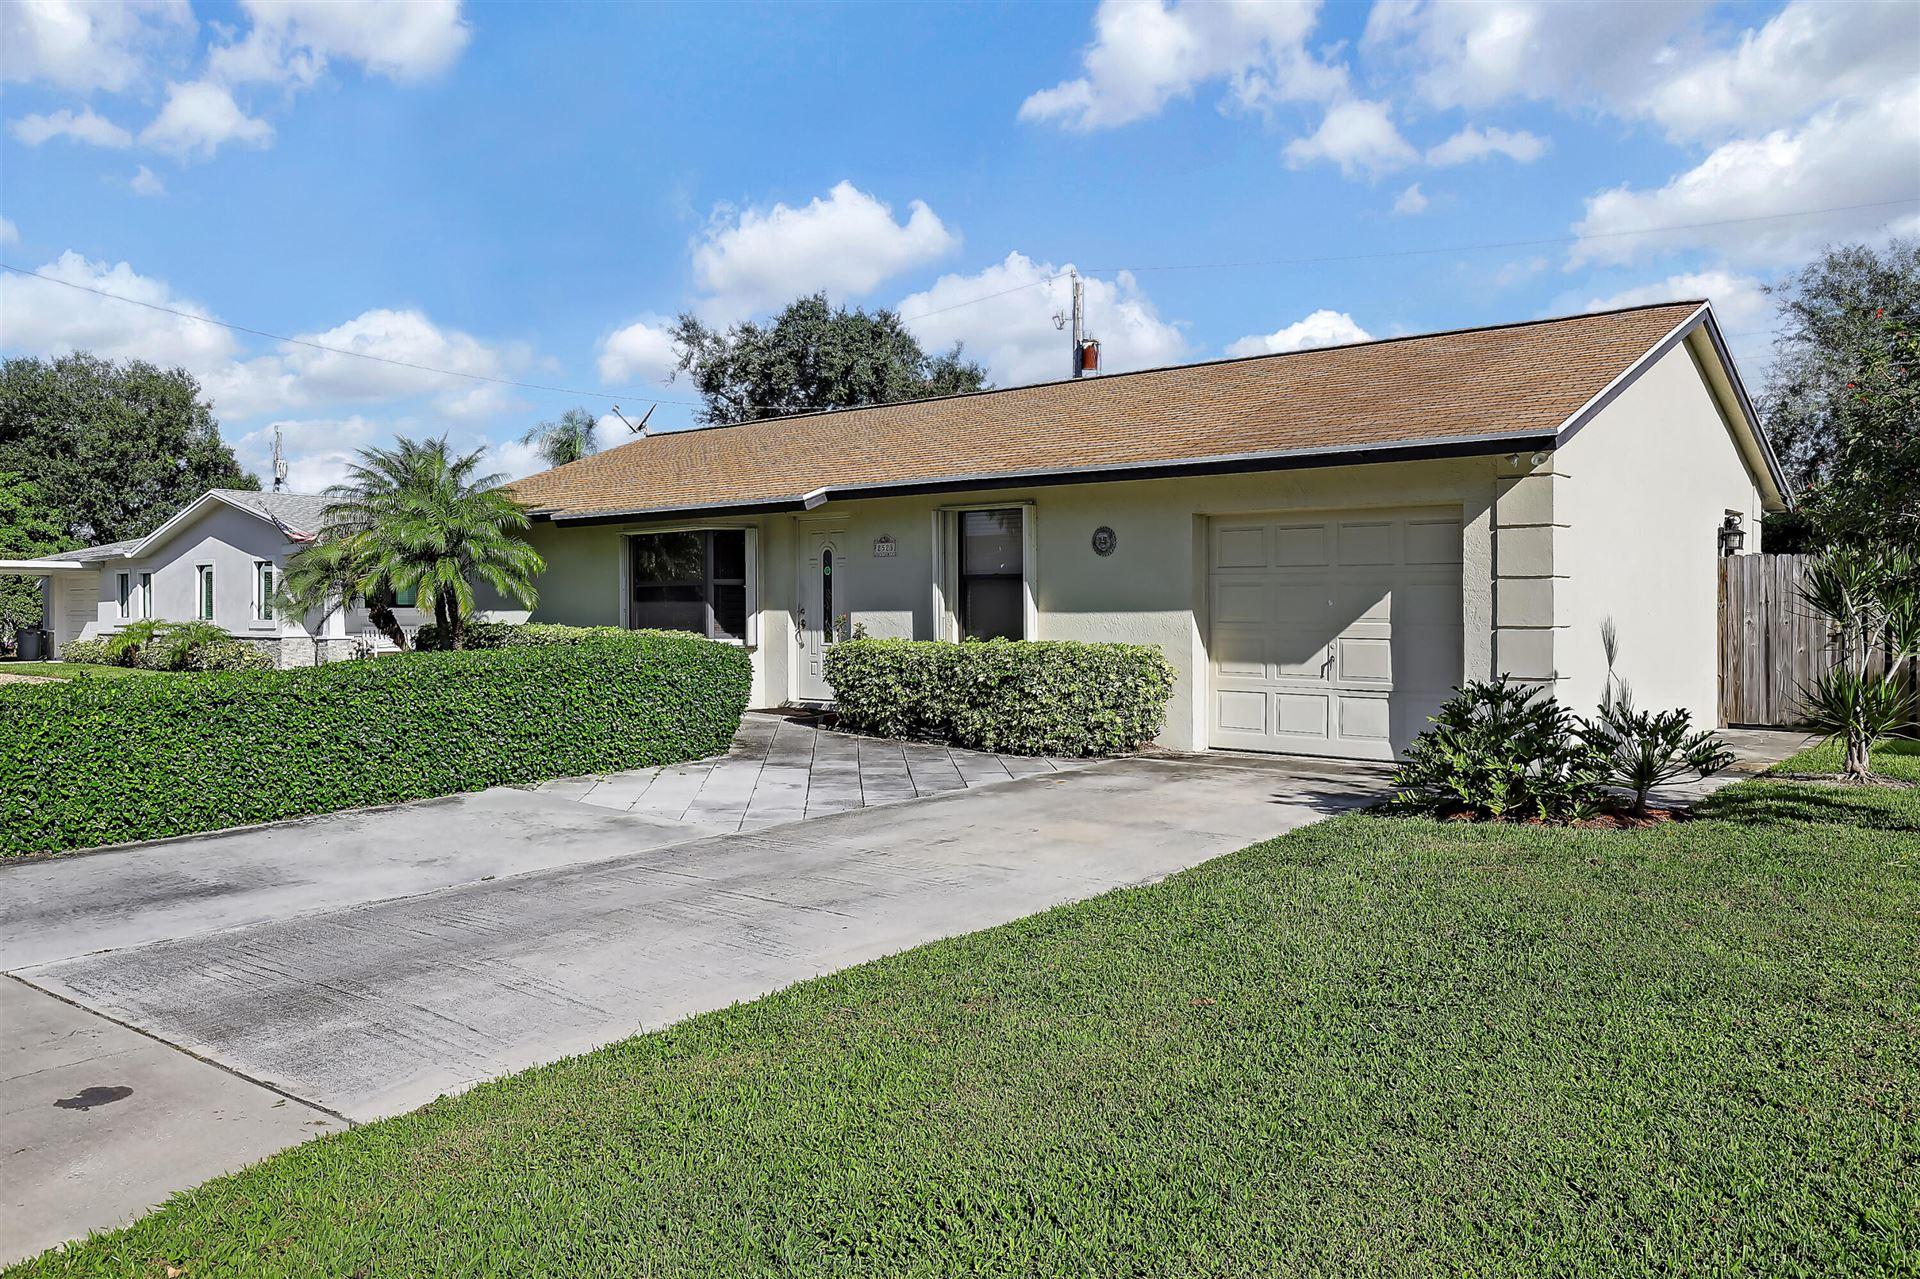 Photo of 2523 Wabash Drive, North Palm Beach, FL 33410 (MLS # RX-10749328)